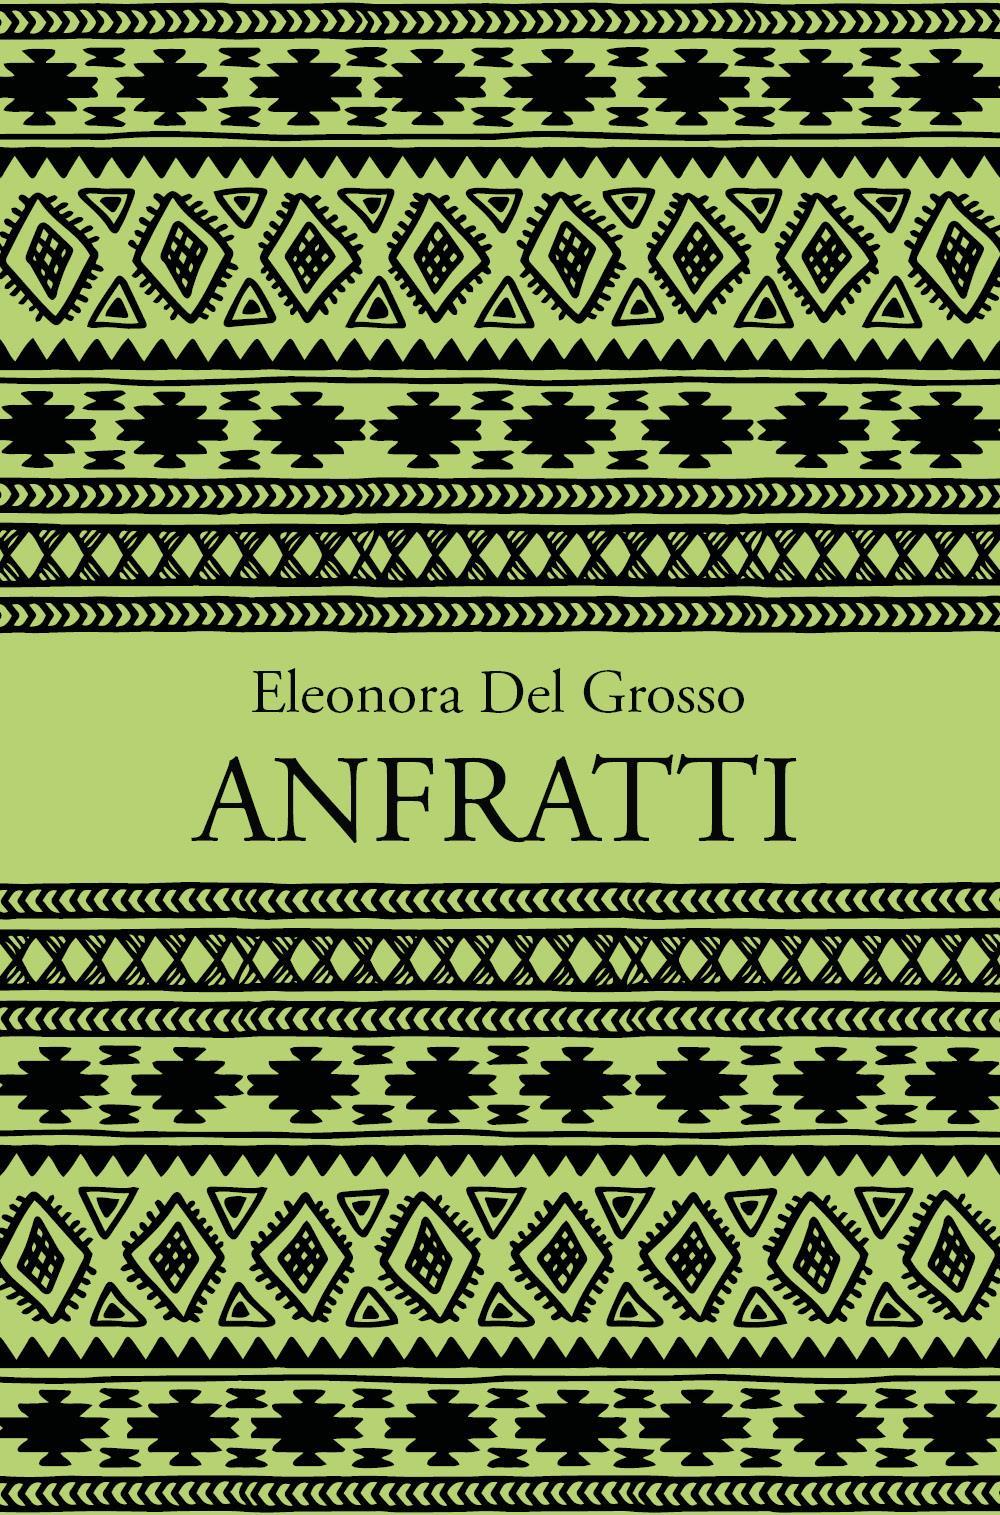 Anfratti